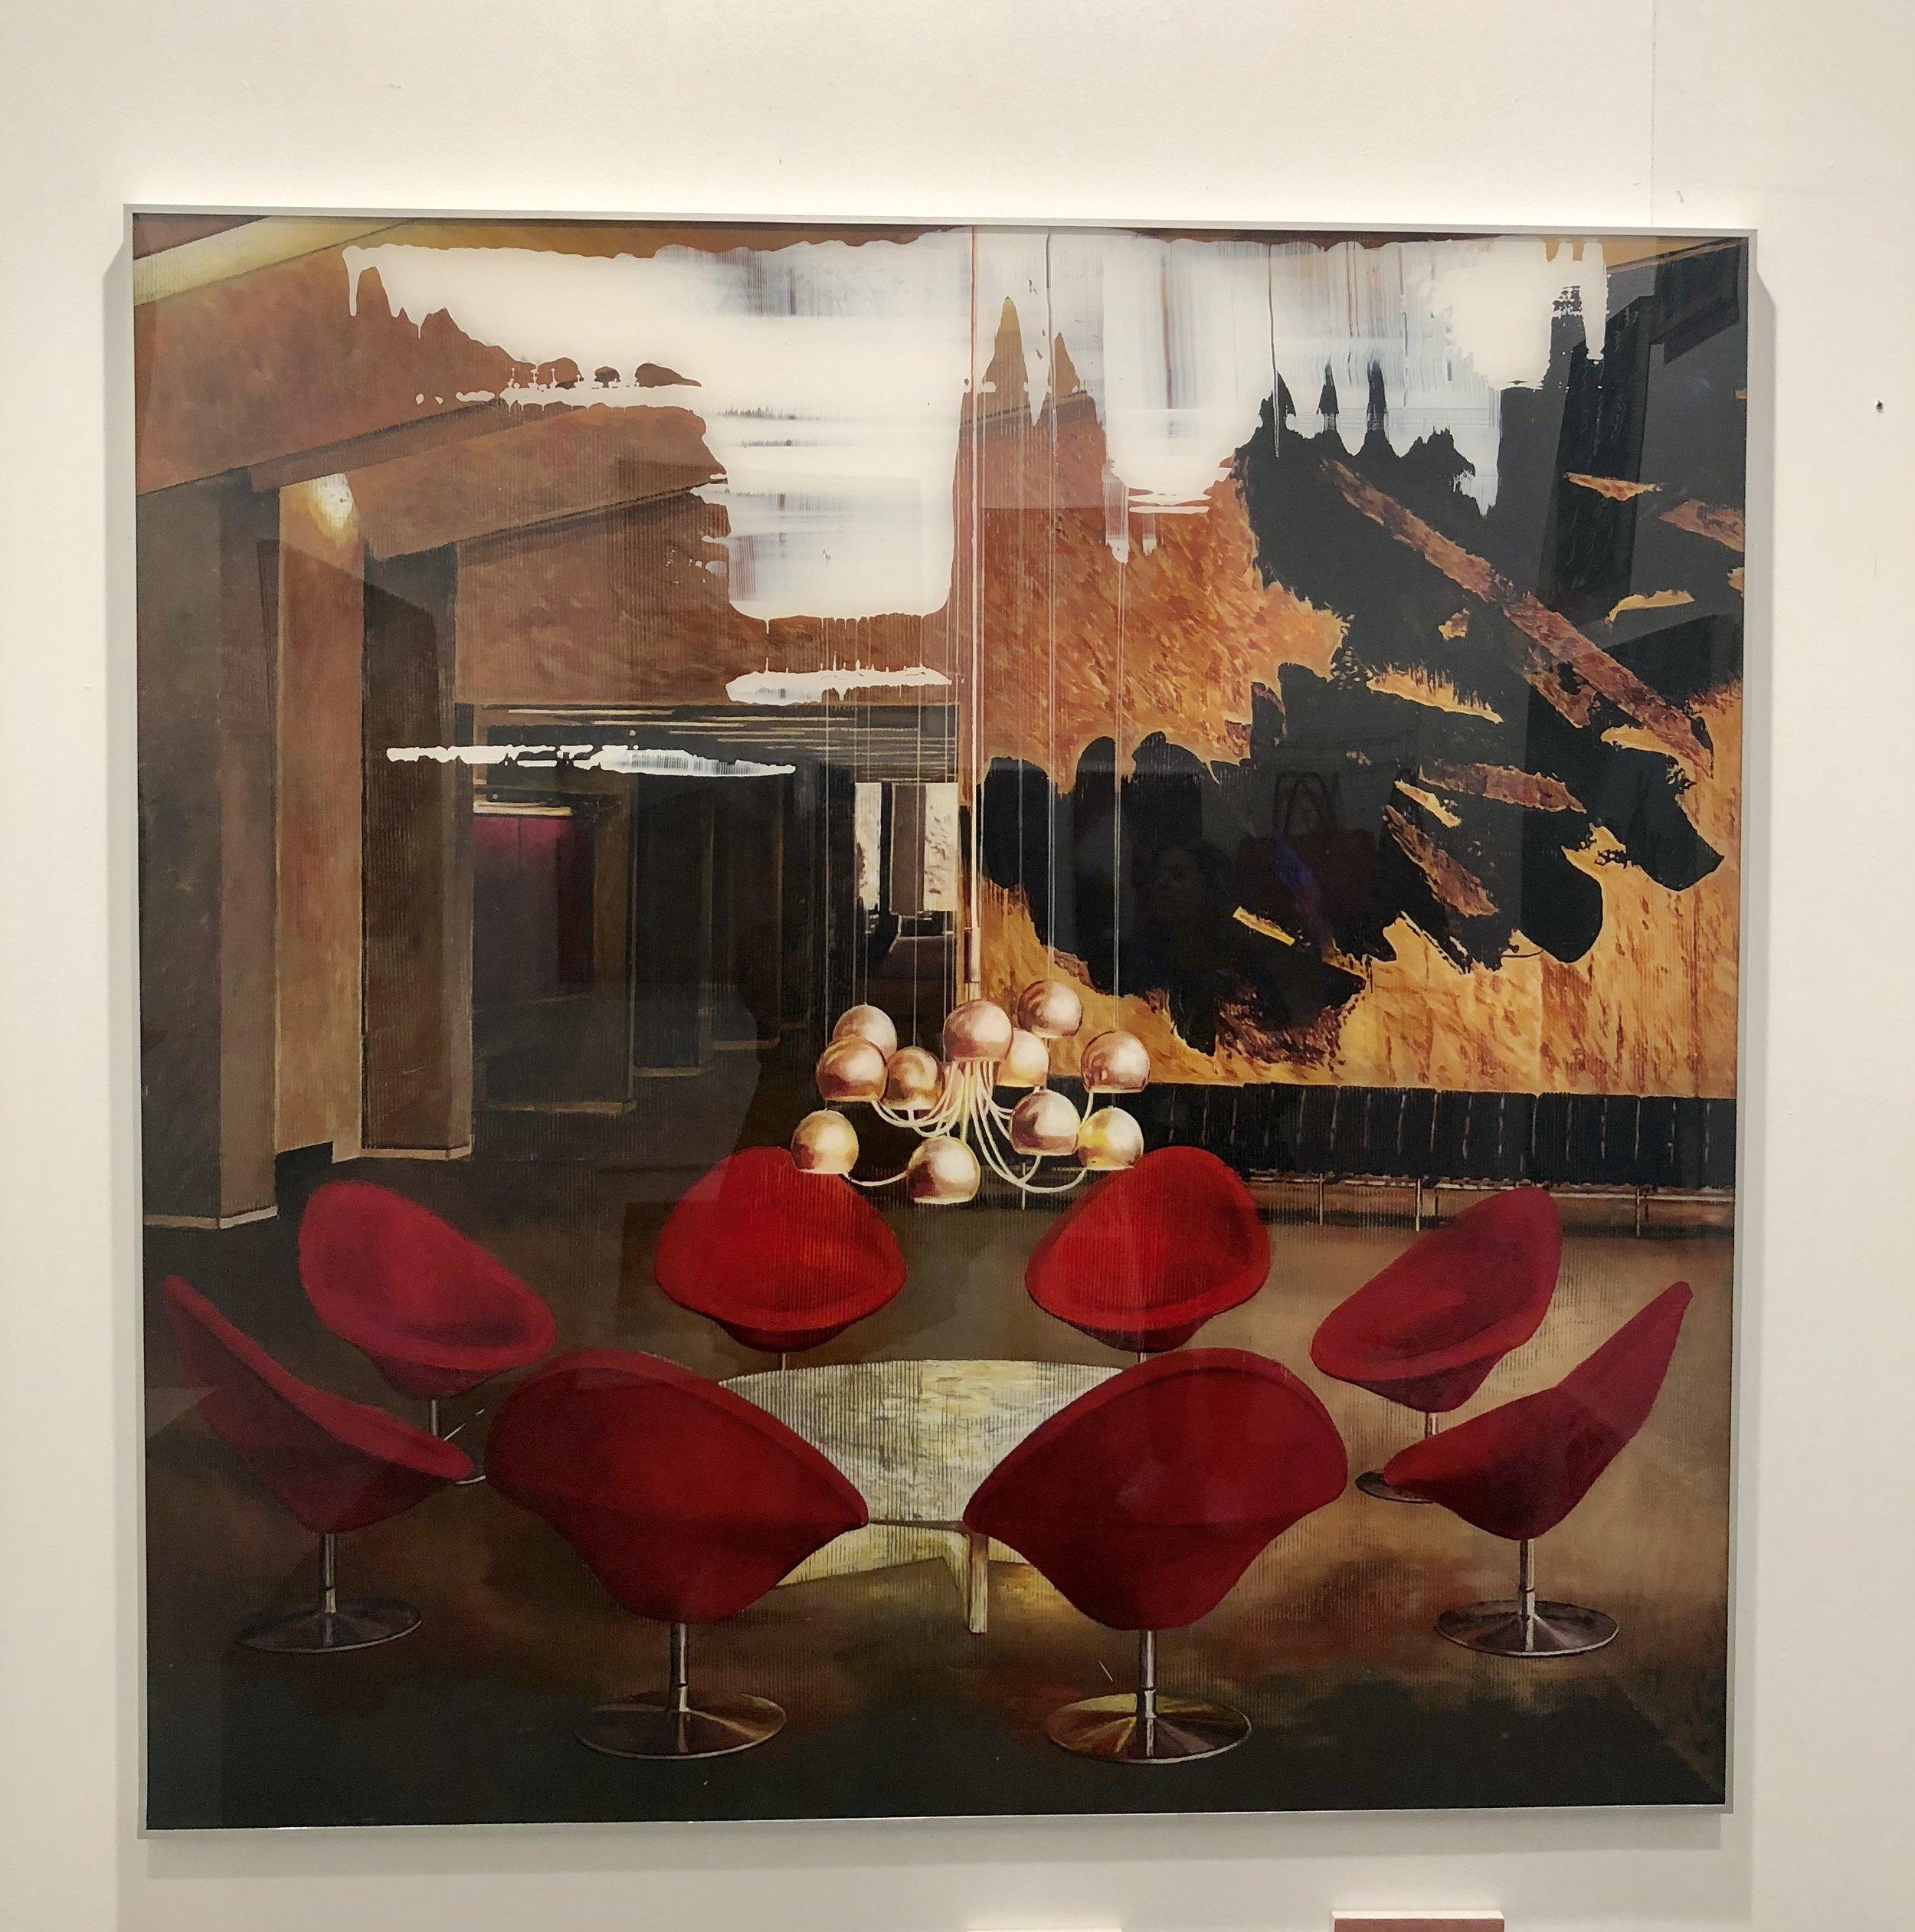 Gil Heitor Cortesao's work at Pedro Cera gallery